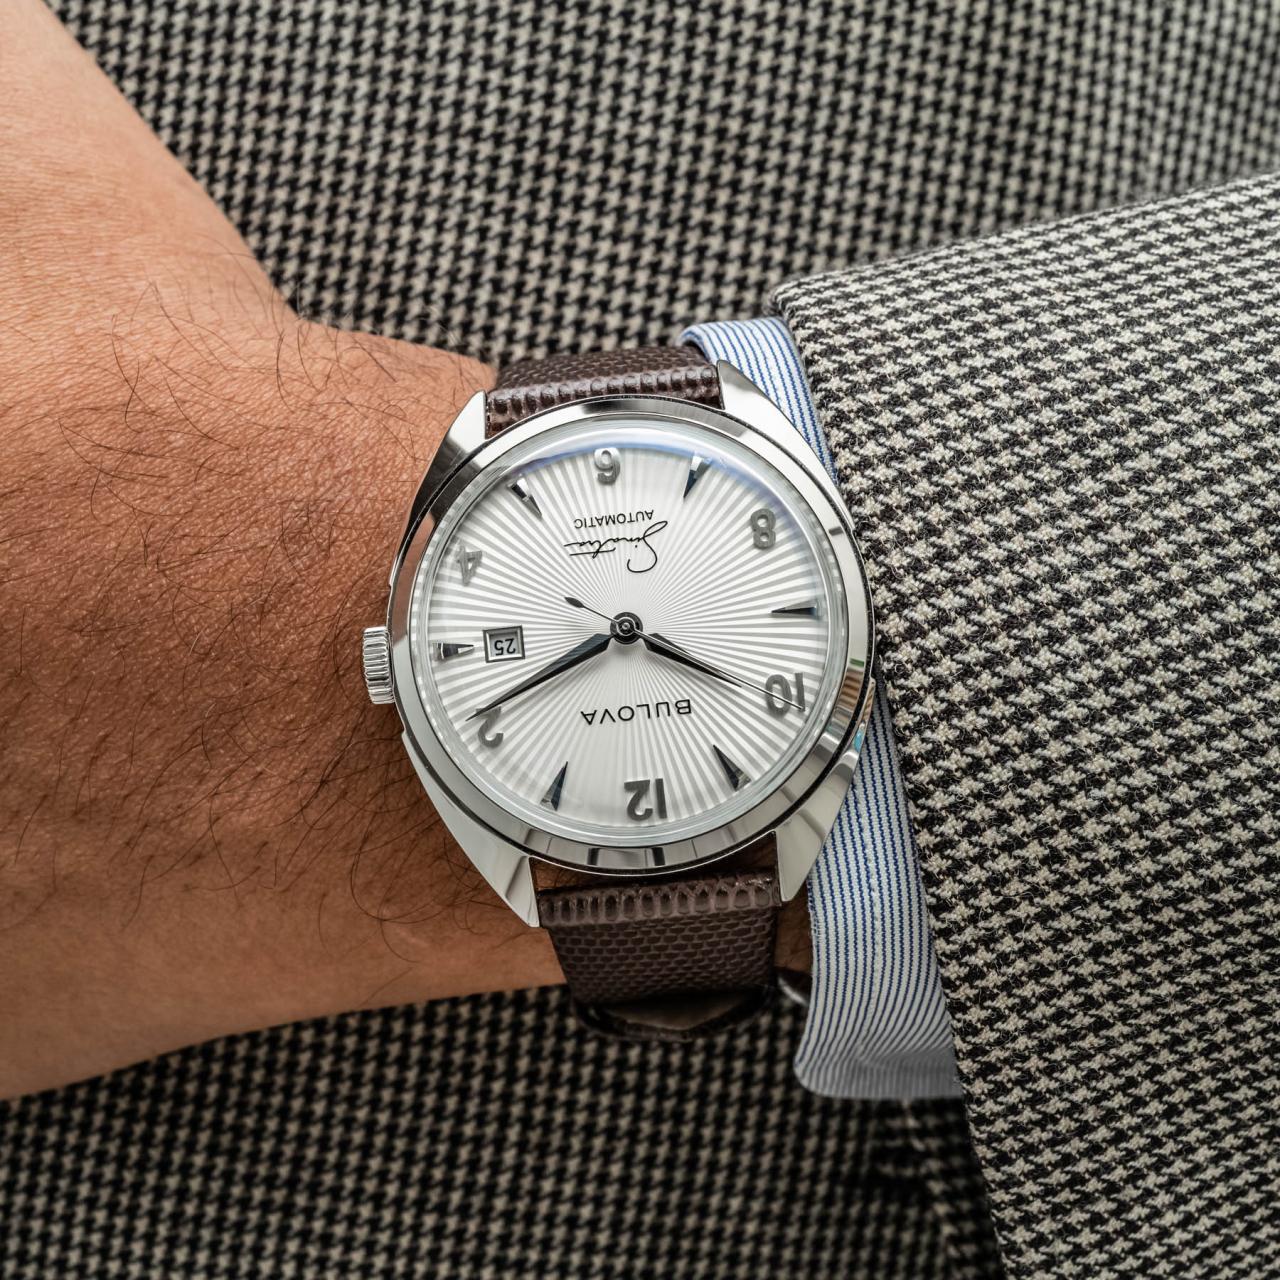 Bulova Frank Sinatra fake Watch Collection